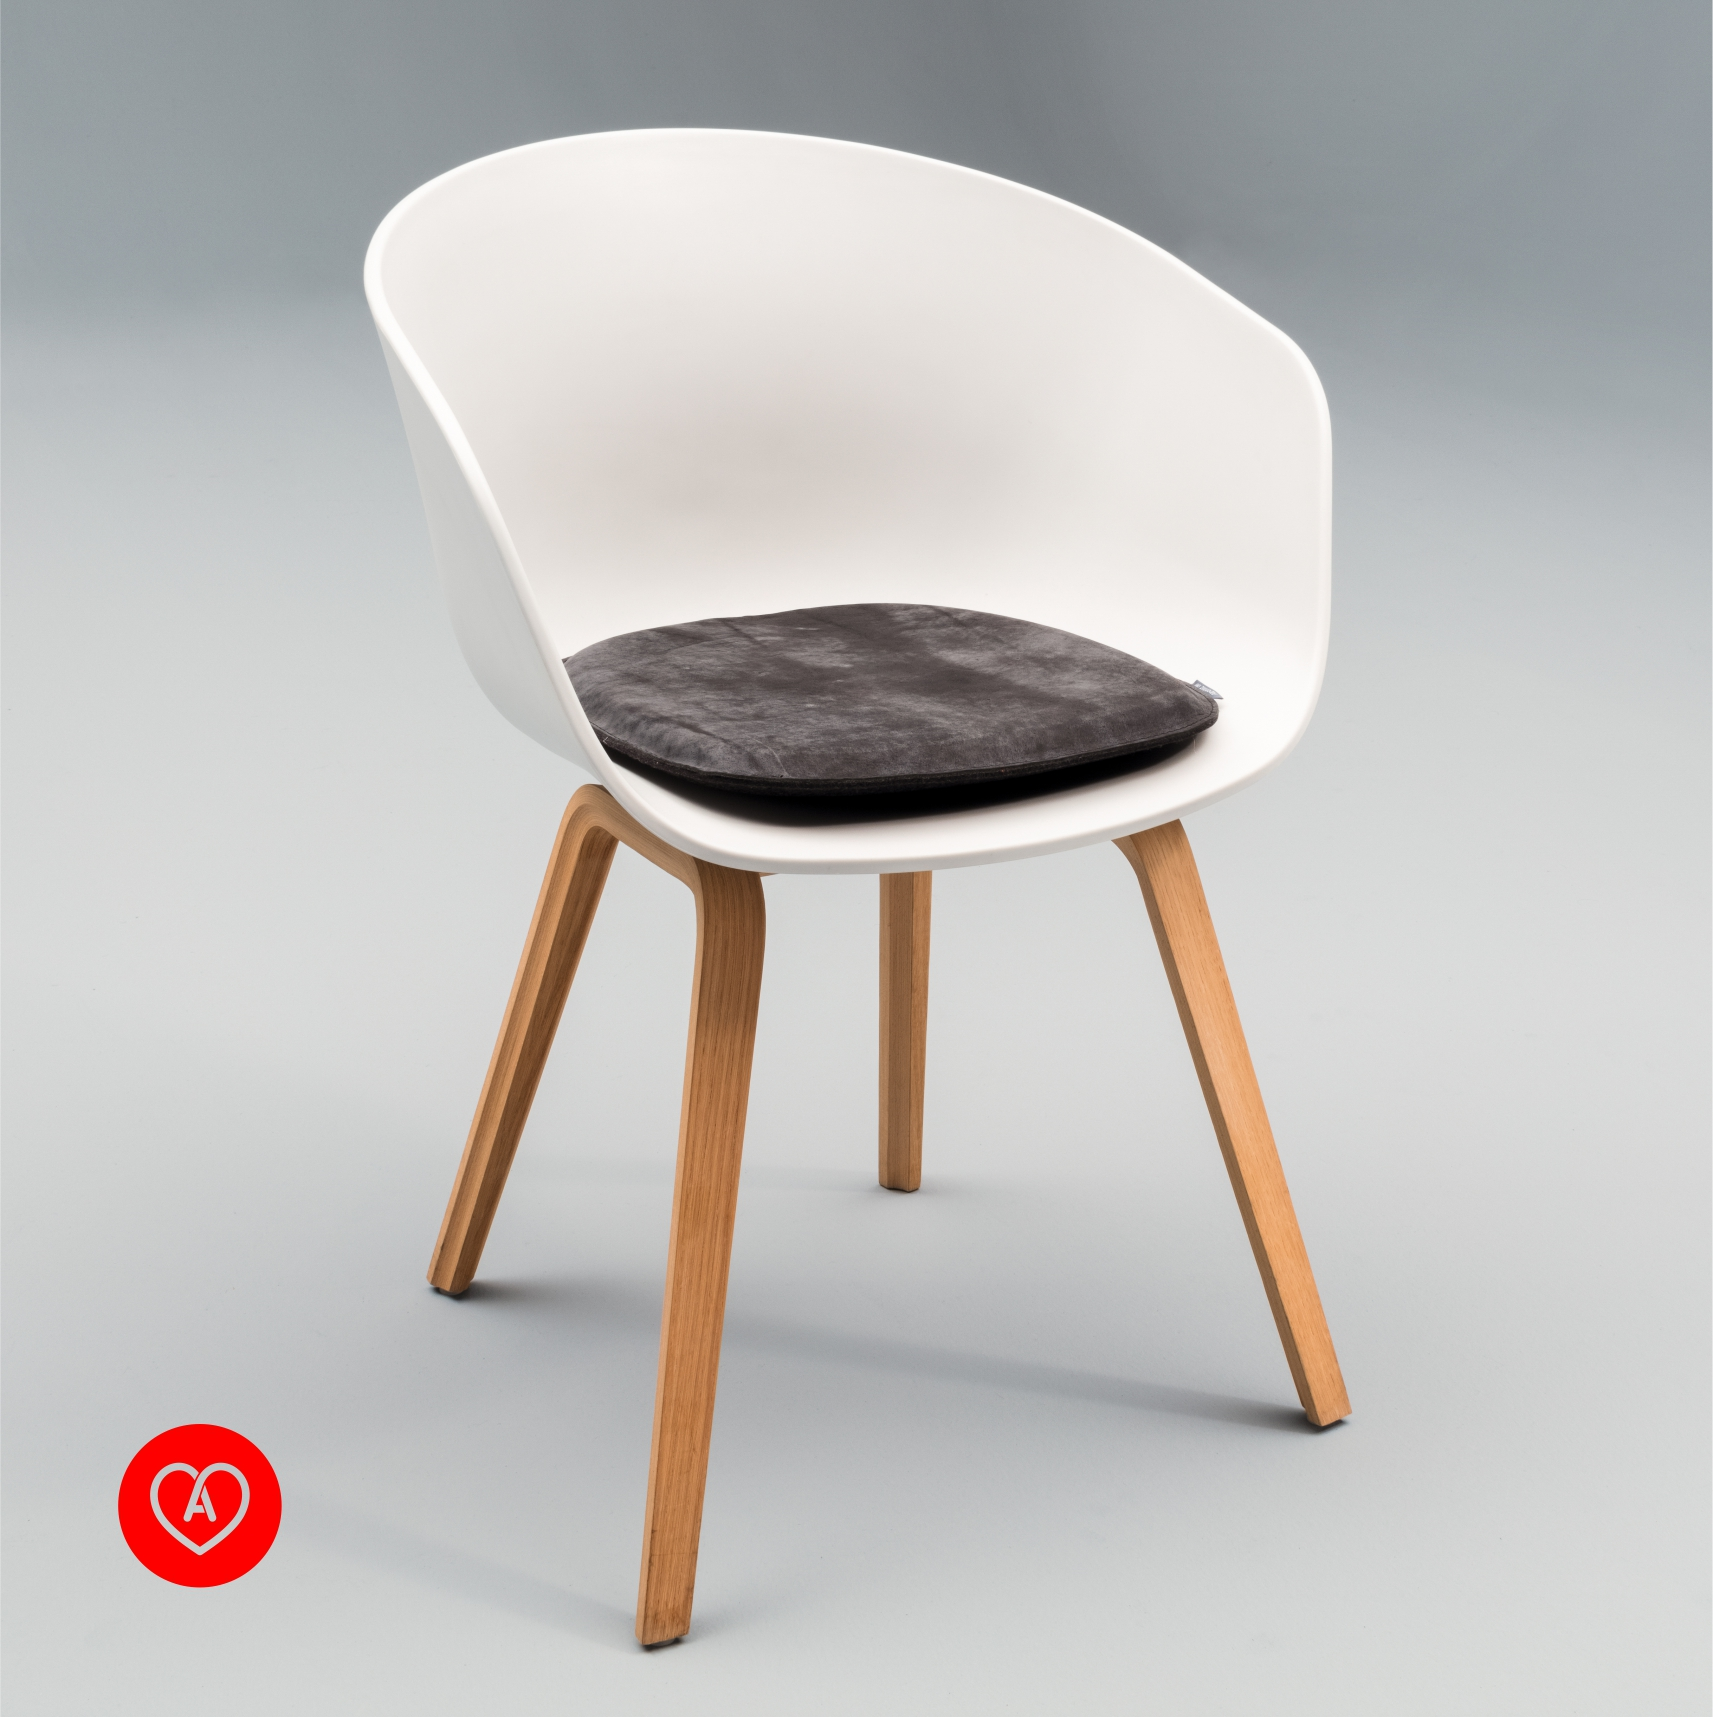 Sitzkissen Aus Leder Filz Passend Fur Hay About A Chair Acc 22 Alpenfilz